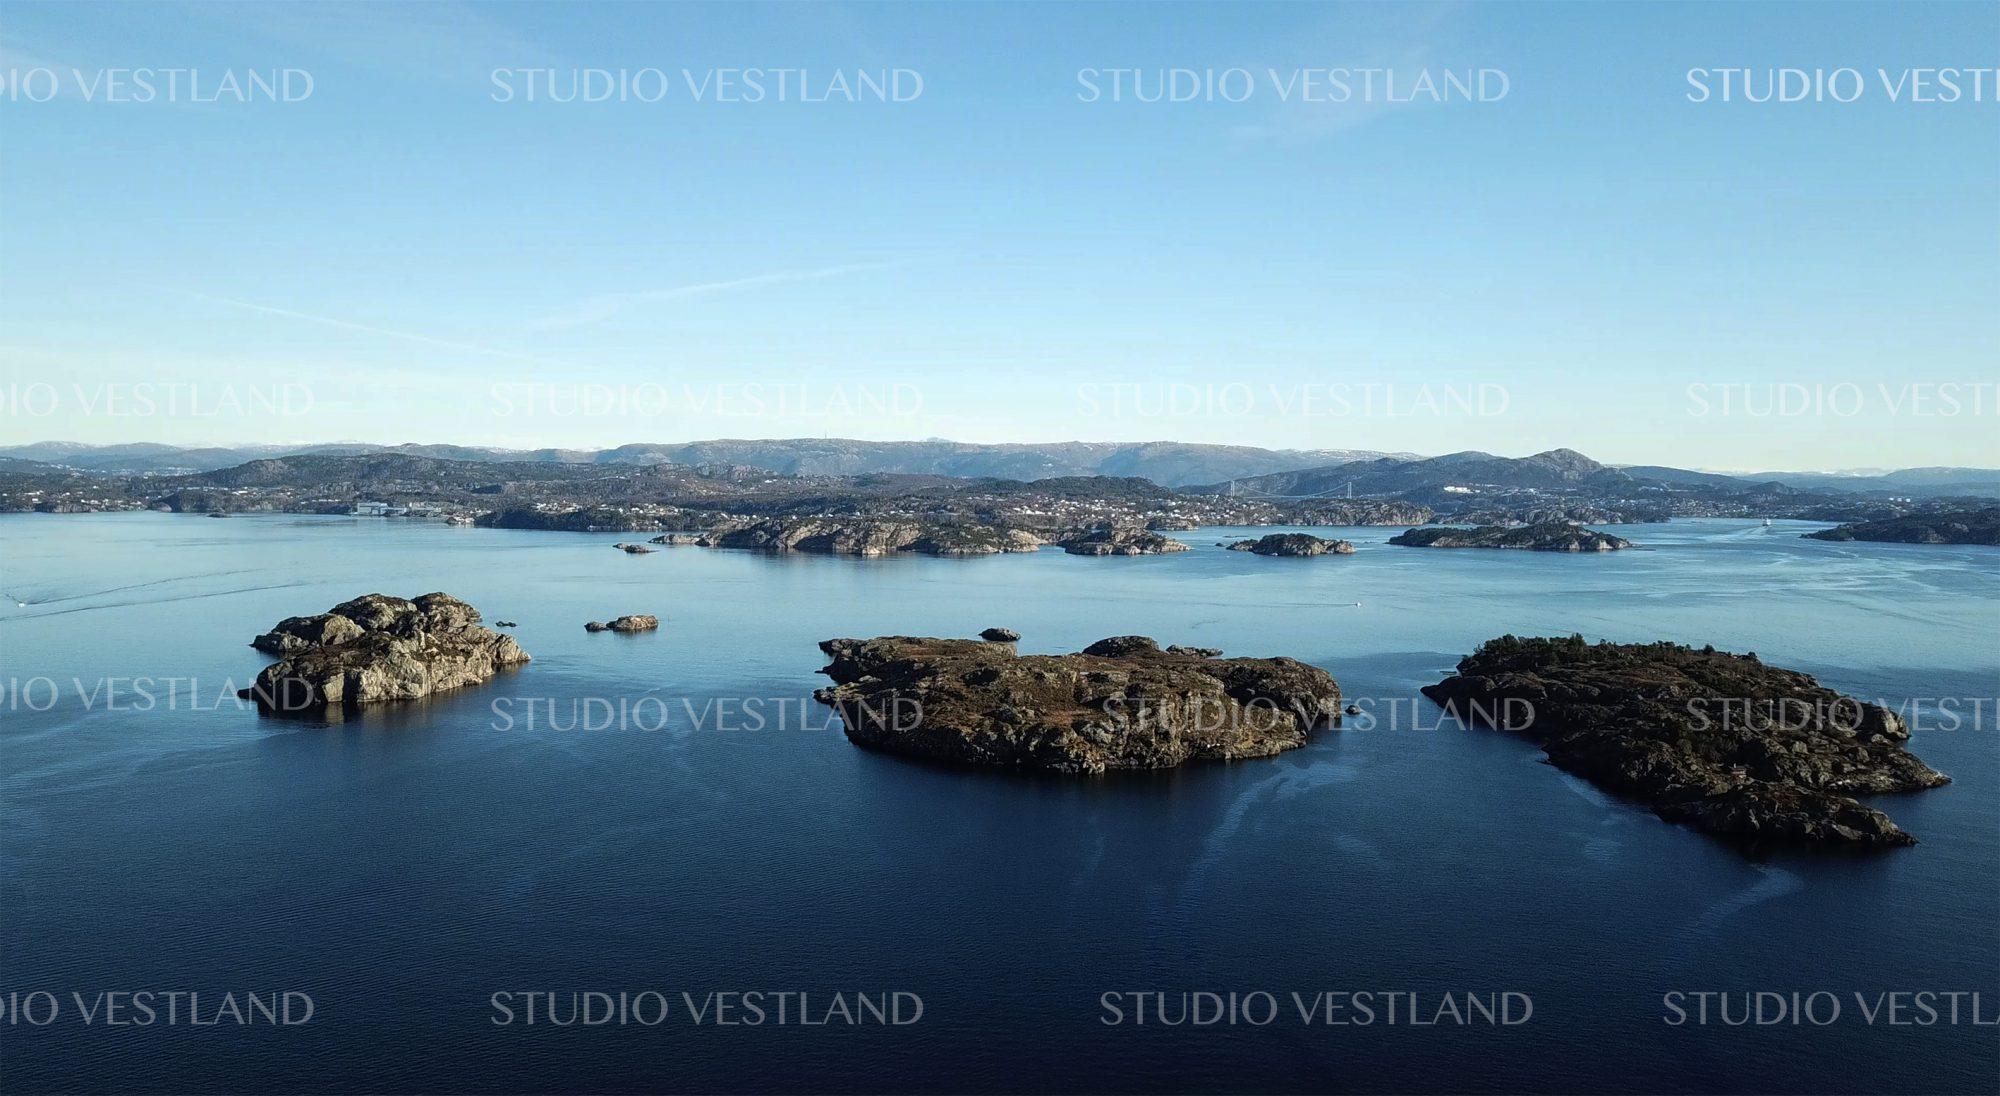 Studio Vestland - Ågotnes omegn 01